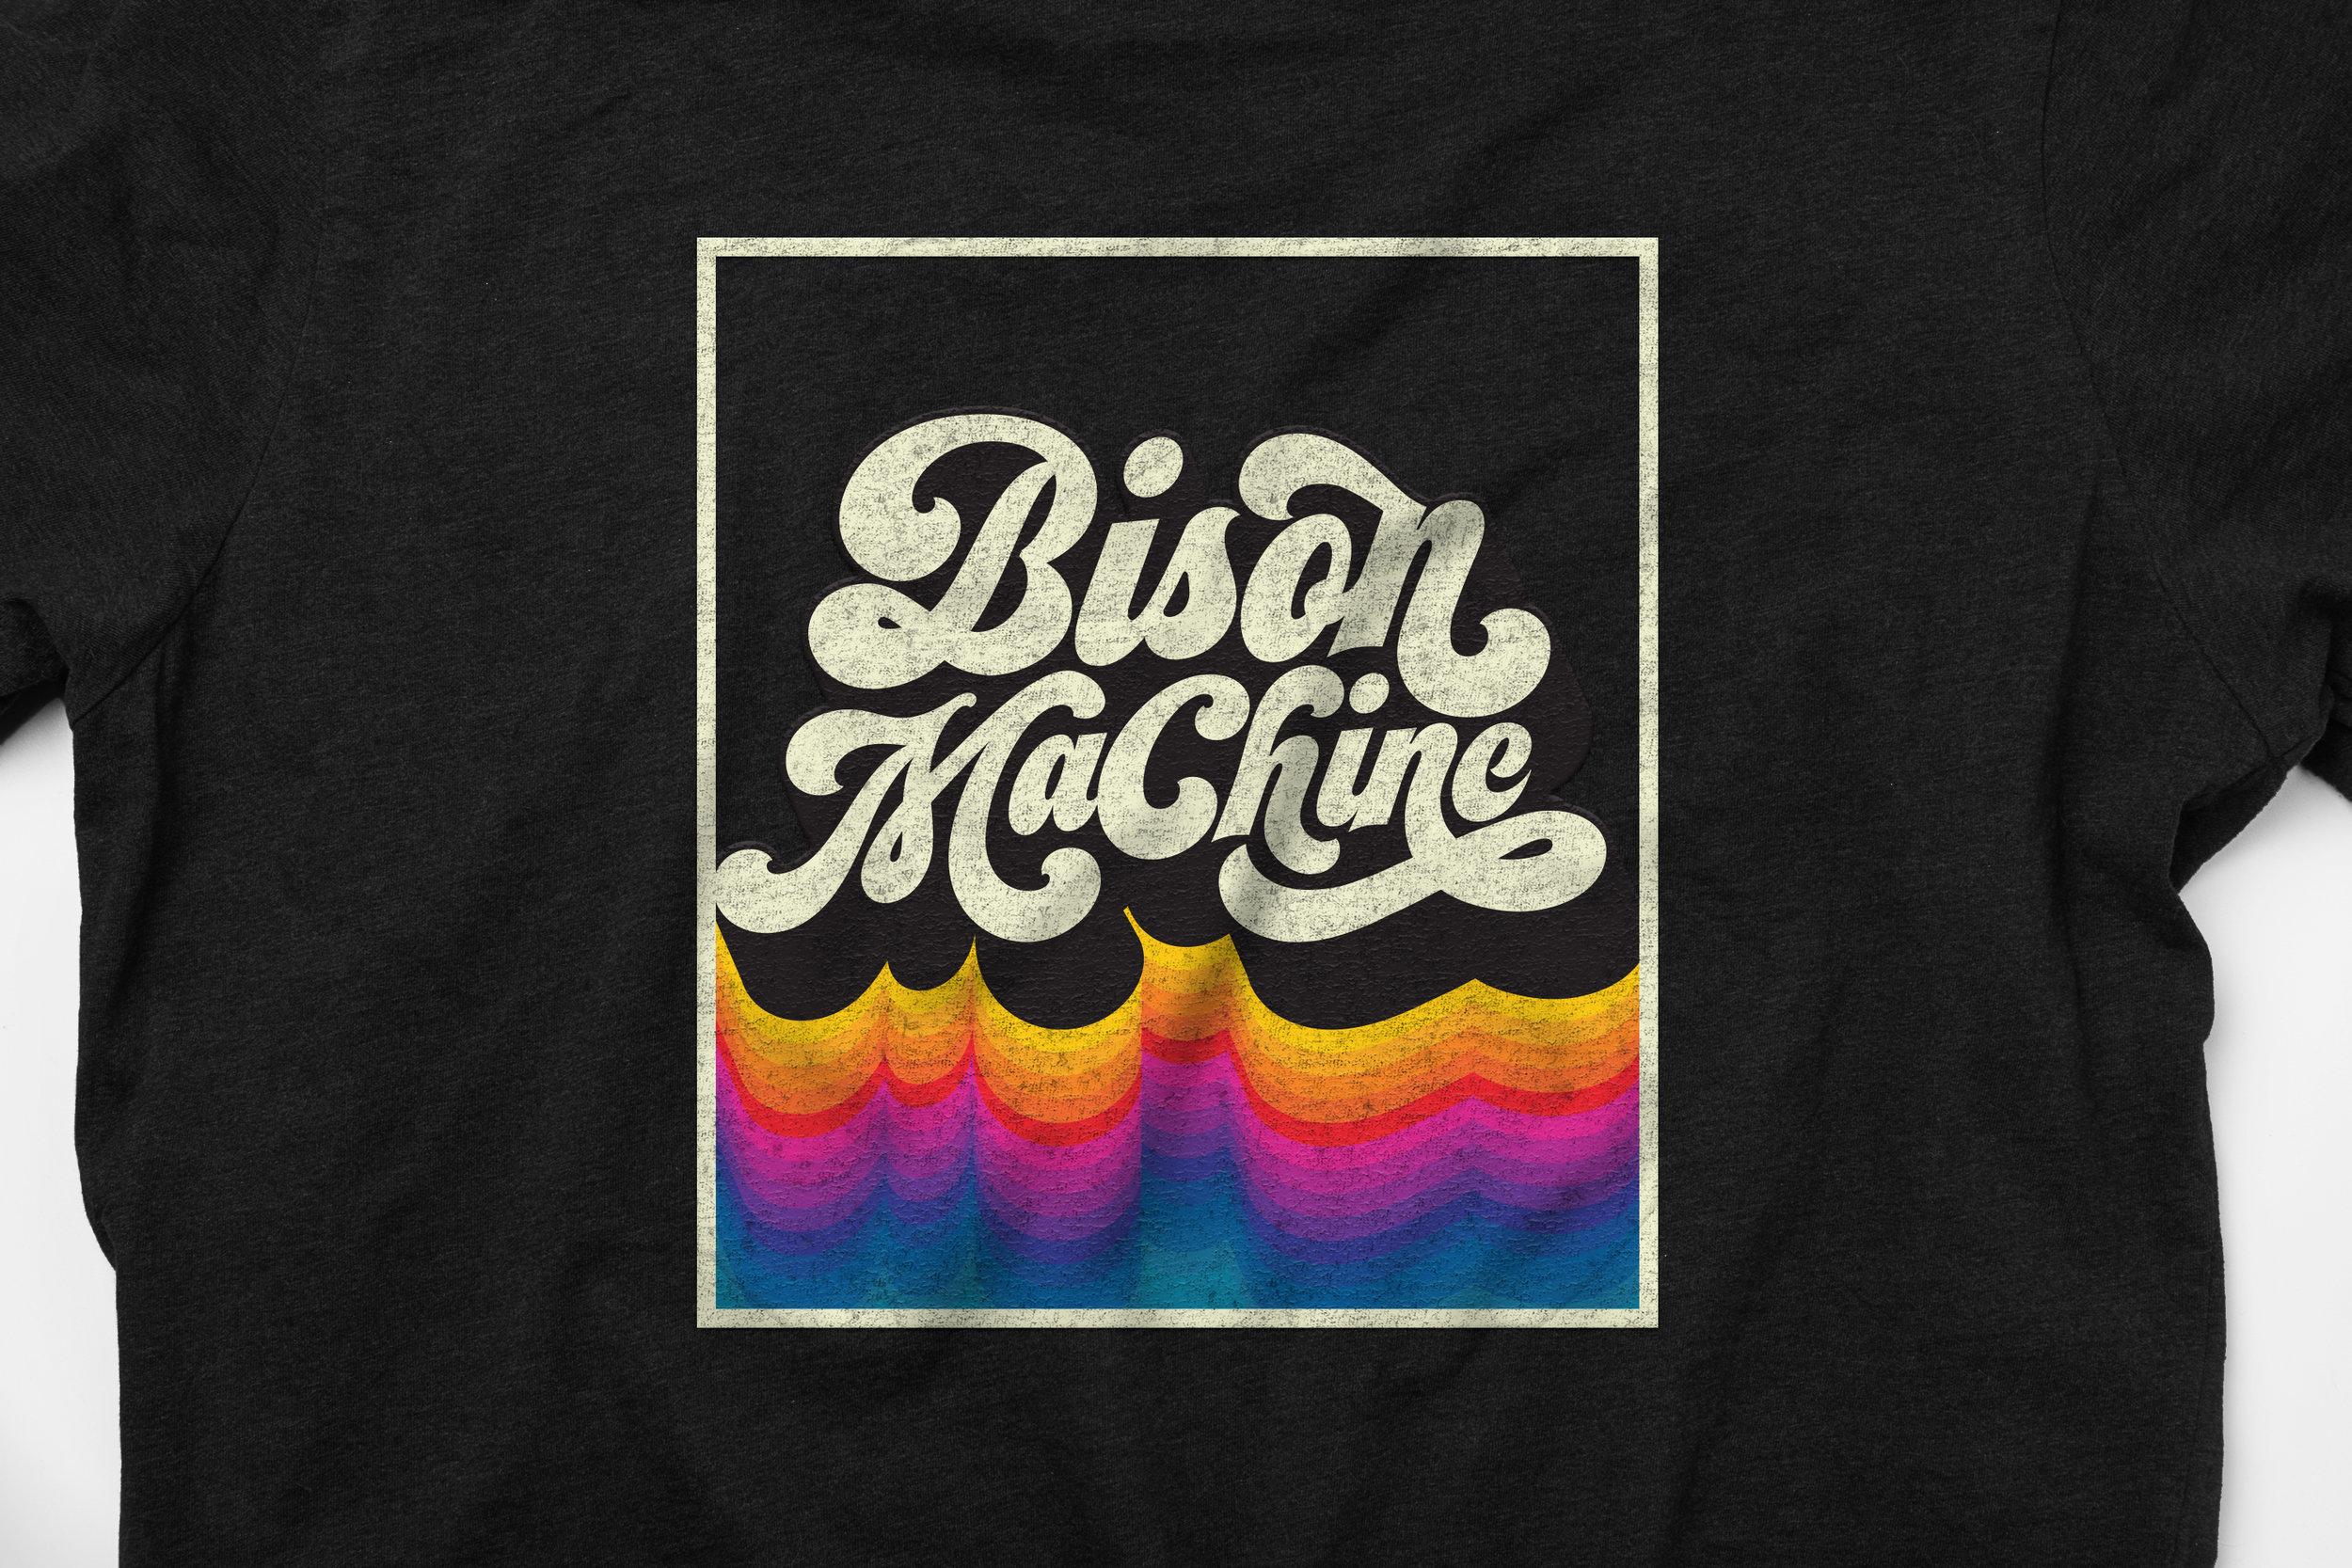 Bison_Machine_Tshirt_Mockup2.jpg